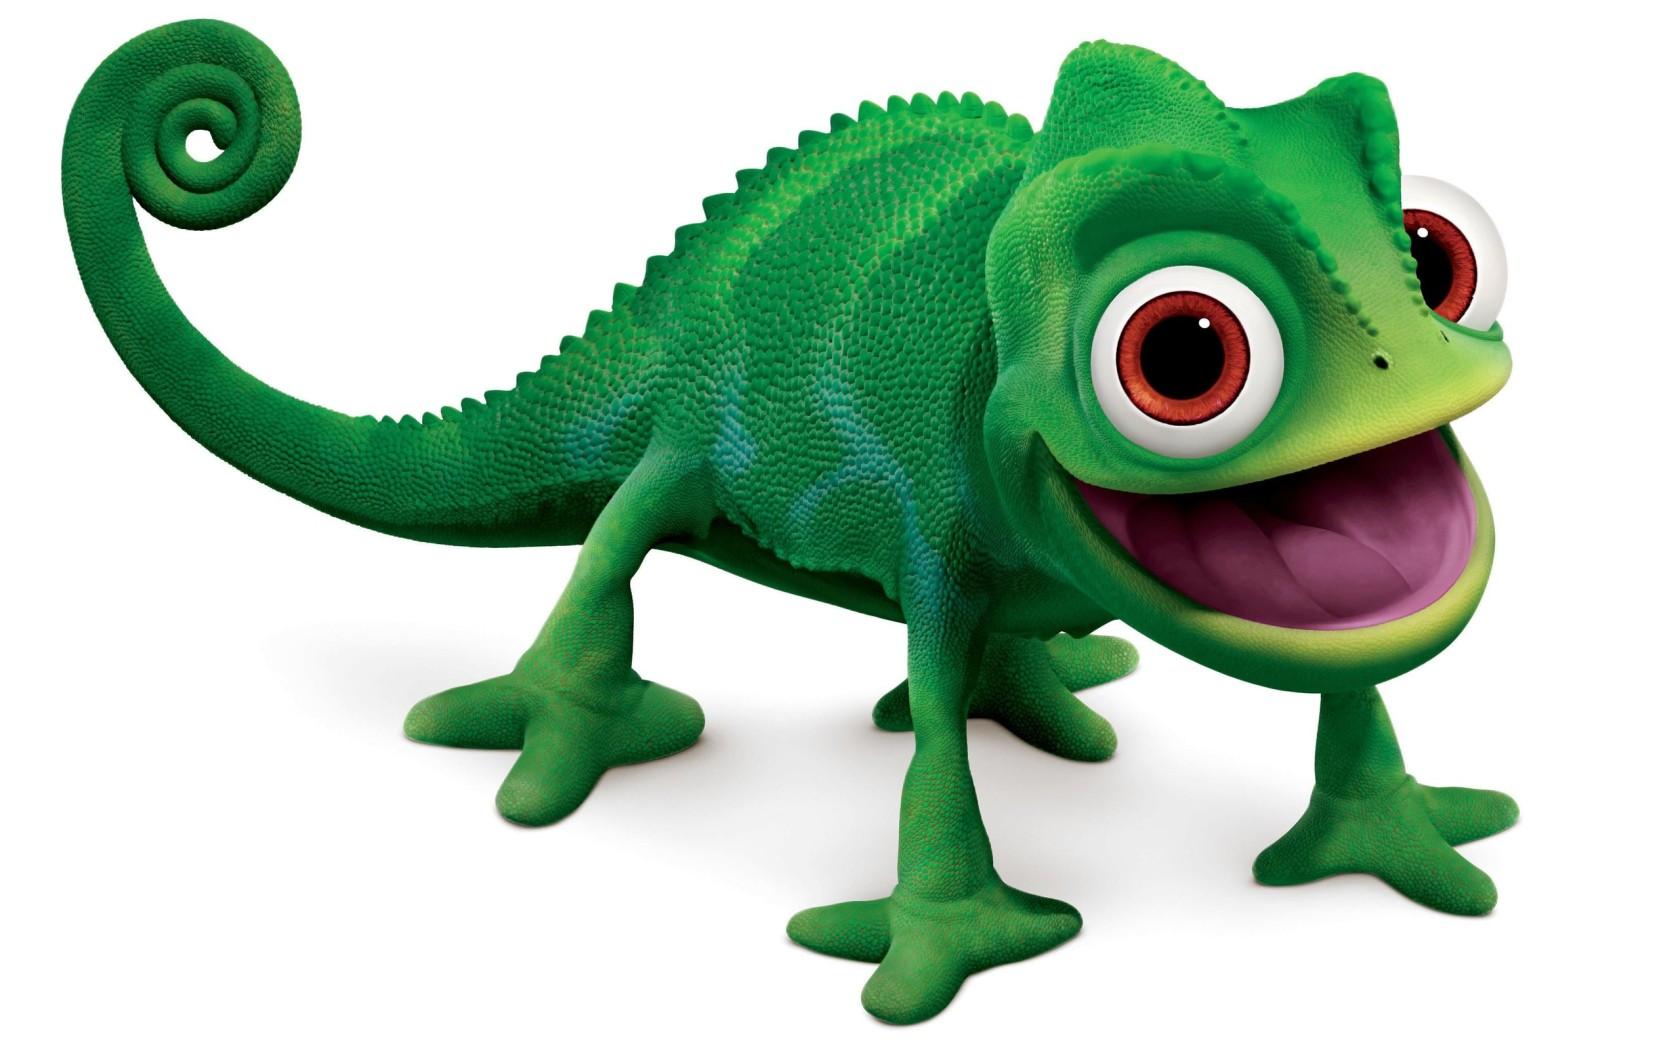 Tangled a chameleon pascal desktop wallpapers 1680x1050 - Raiponce cameleon ...